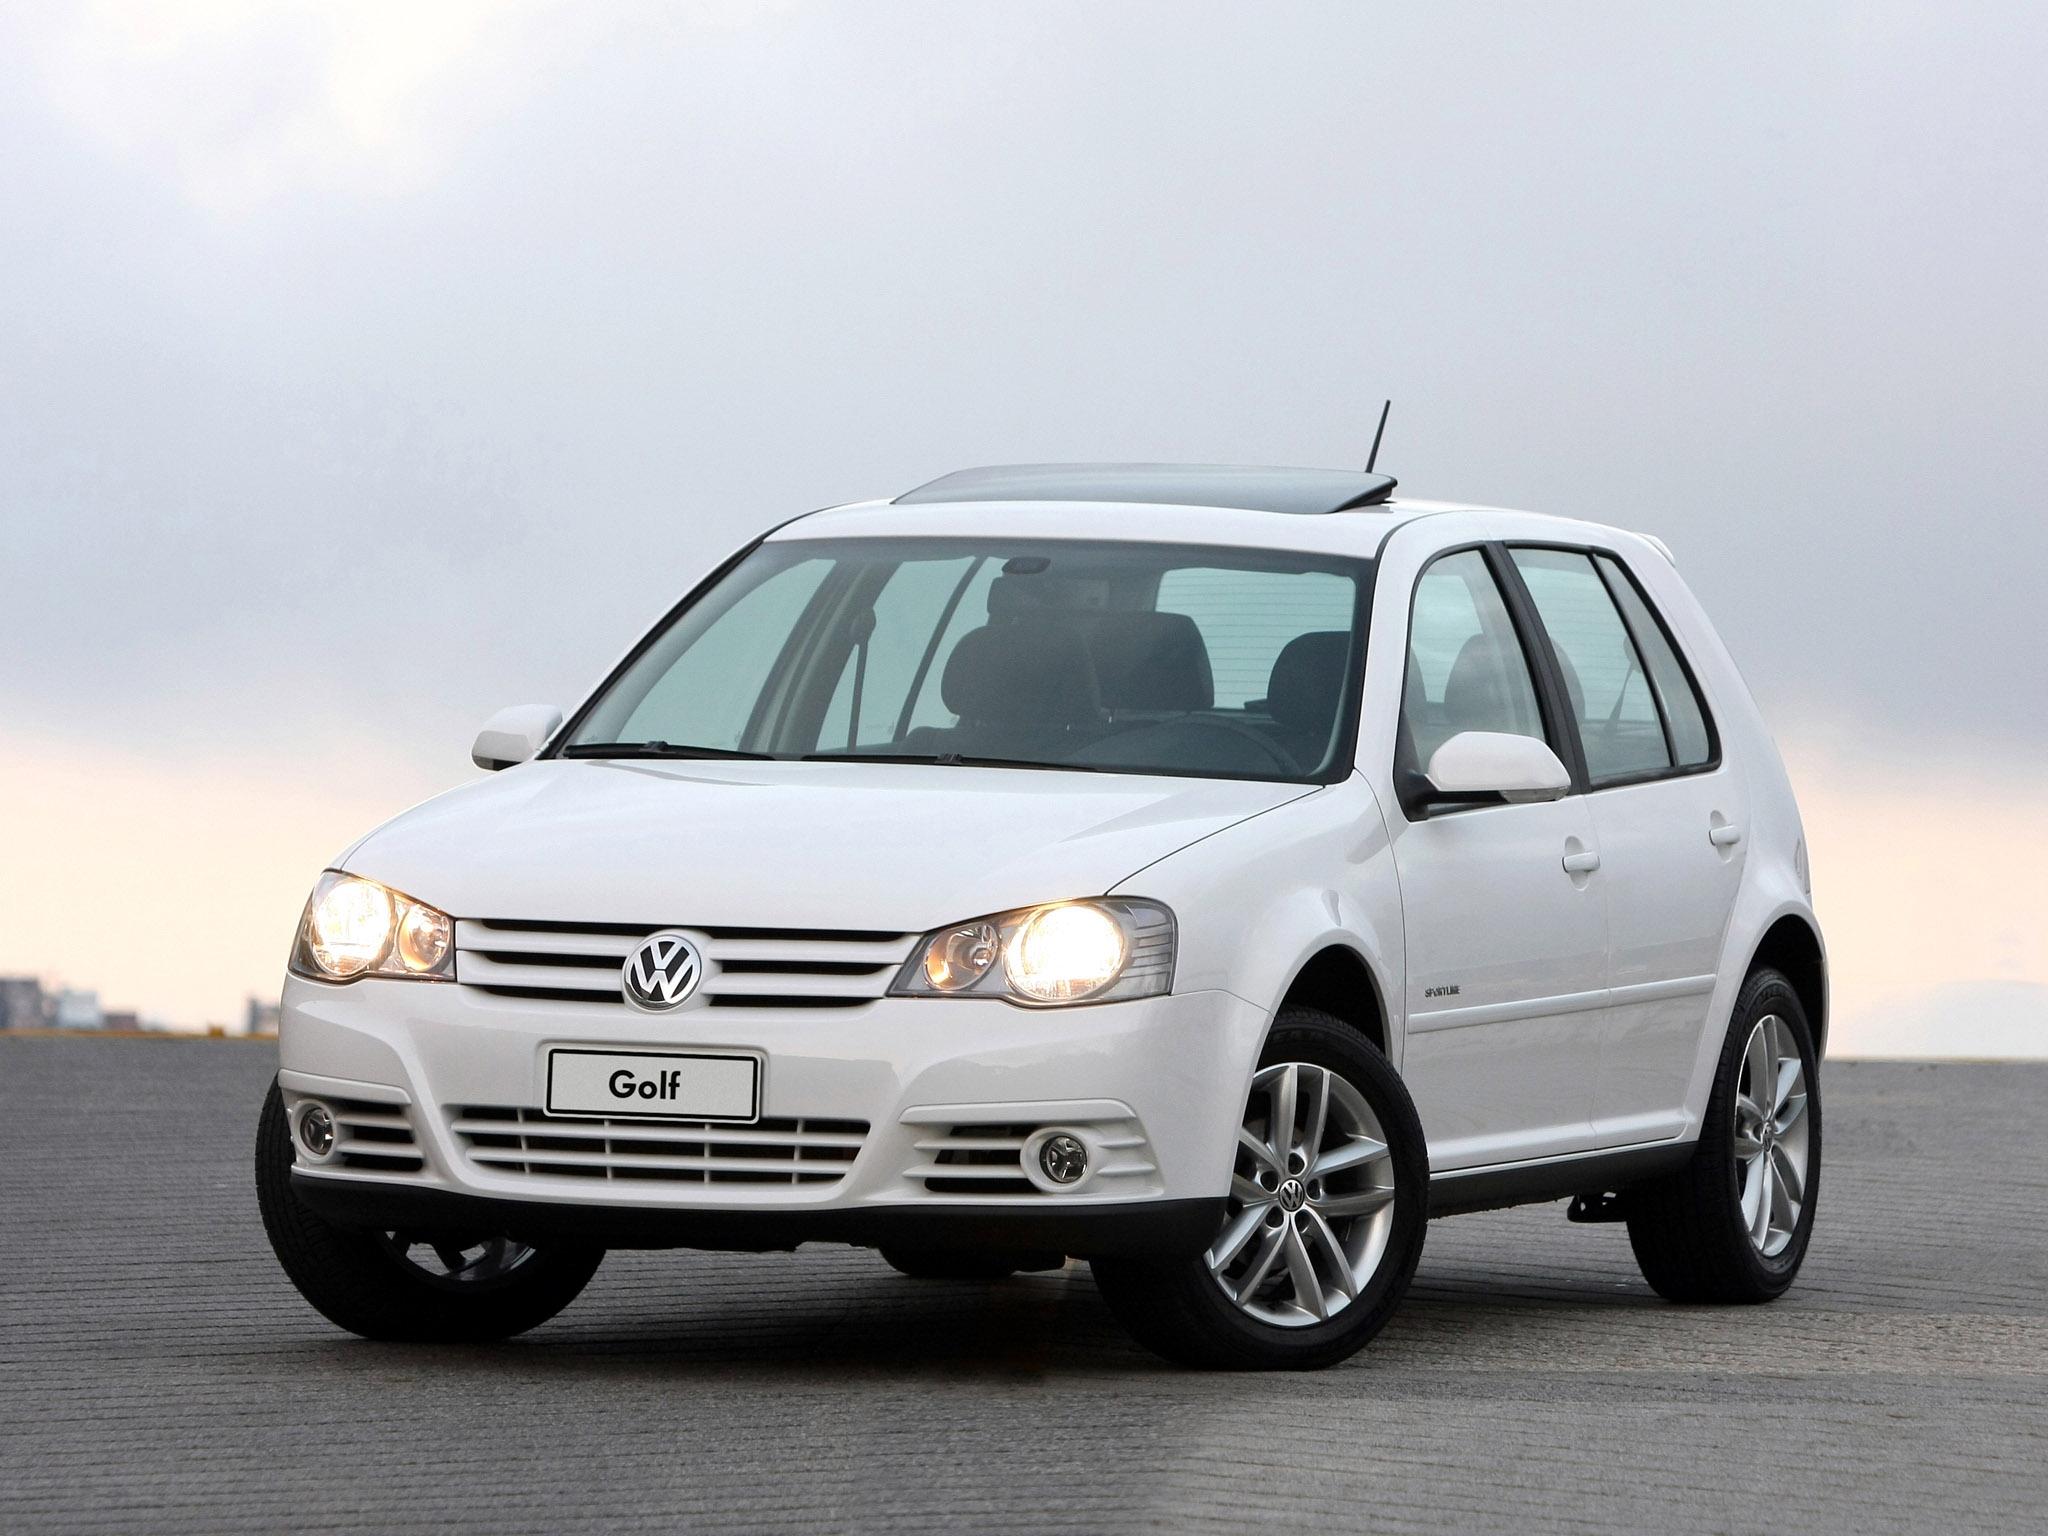 VW Golf 2007 3